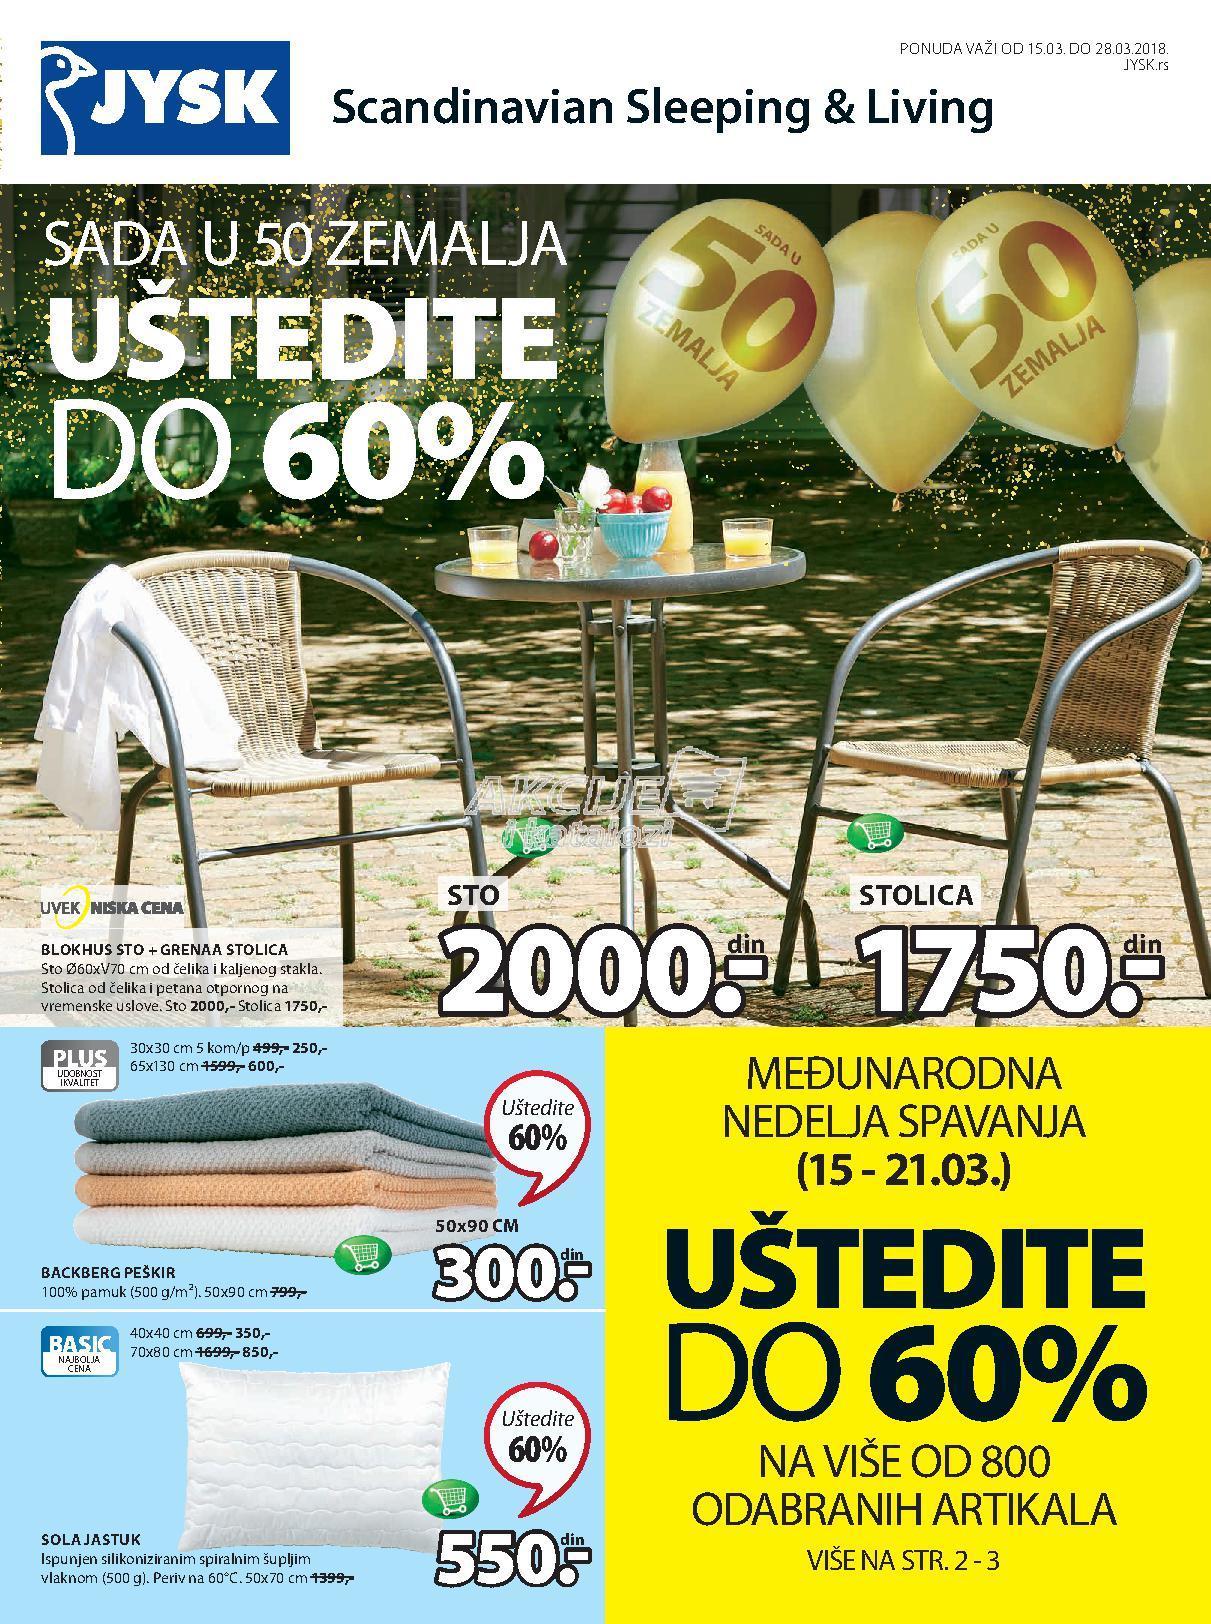 JYSK - Redovna akcija odlične kupovine